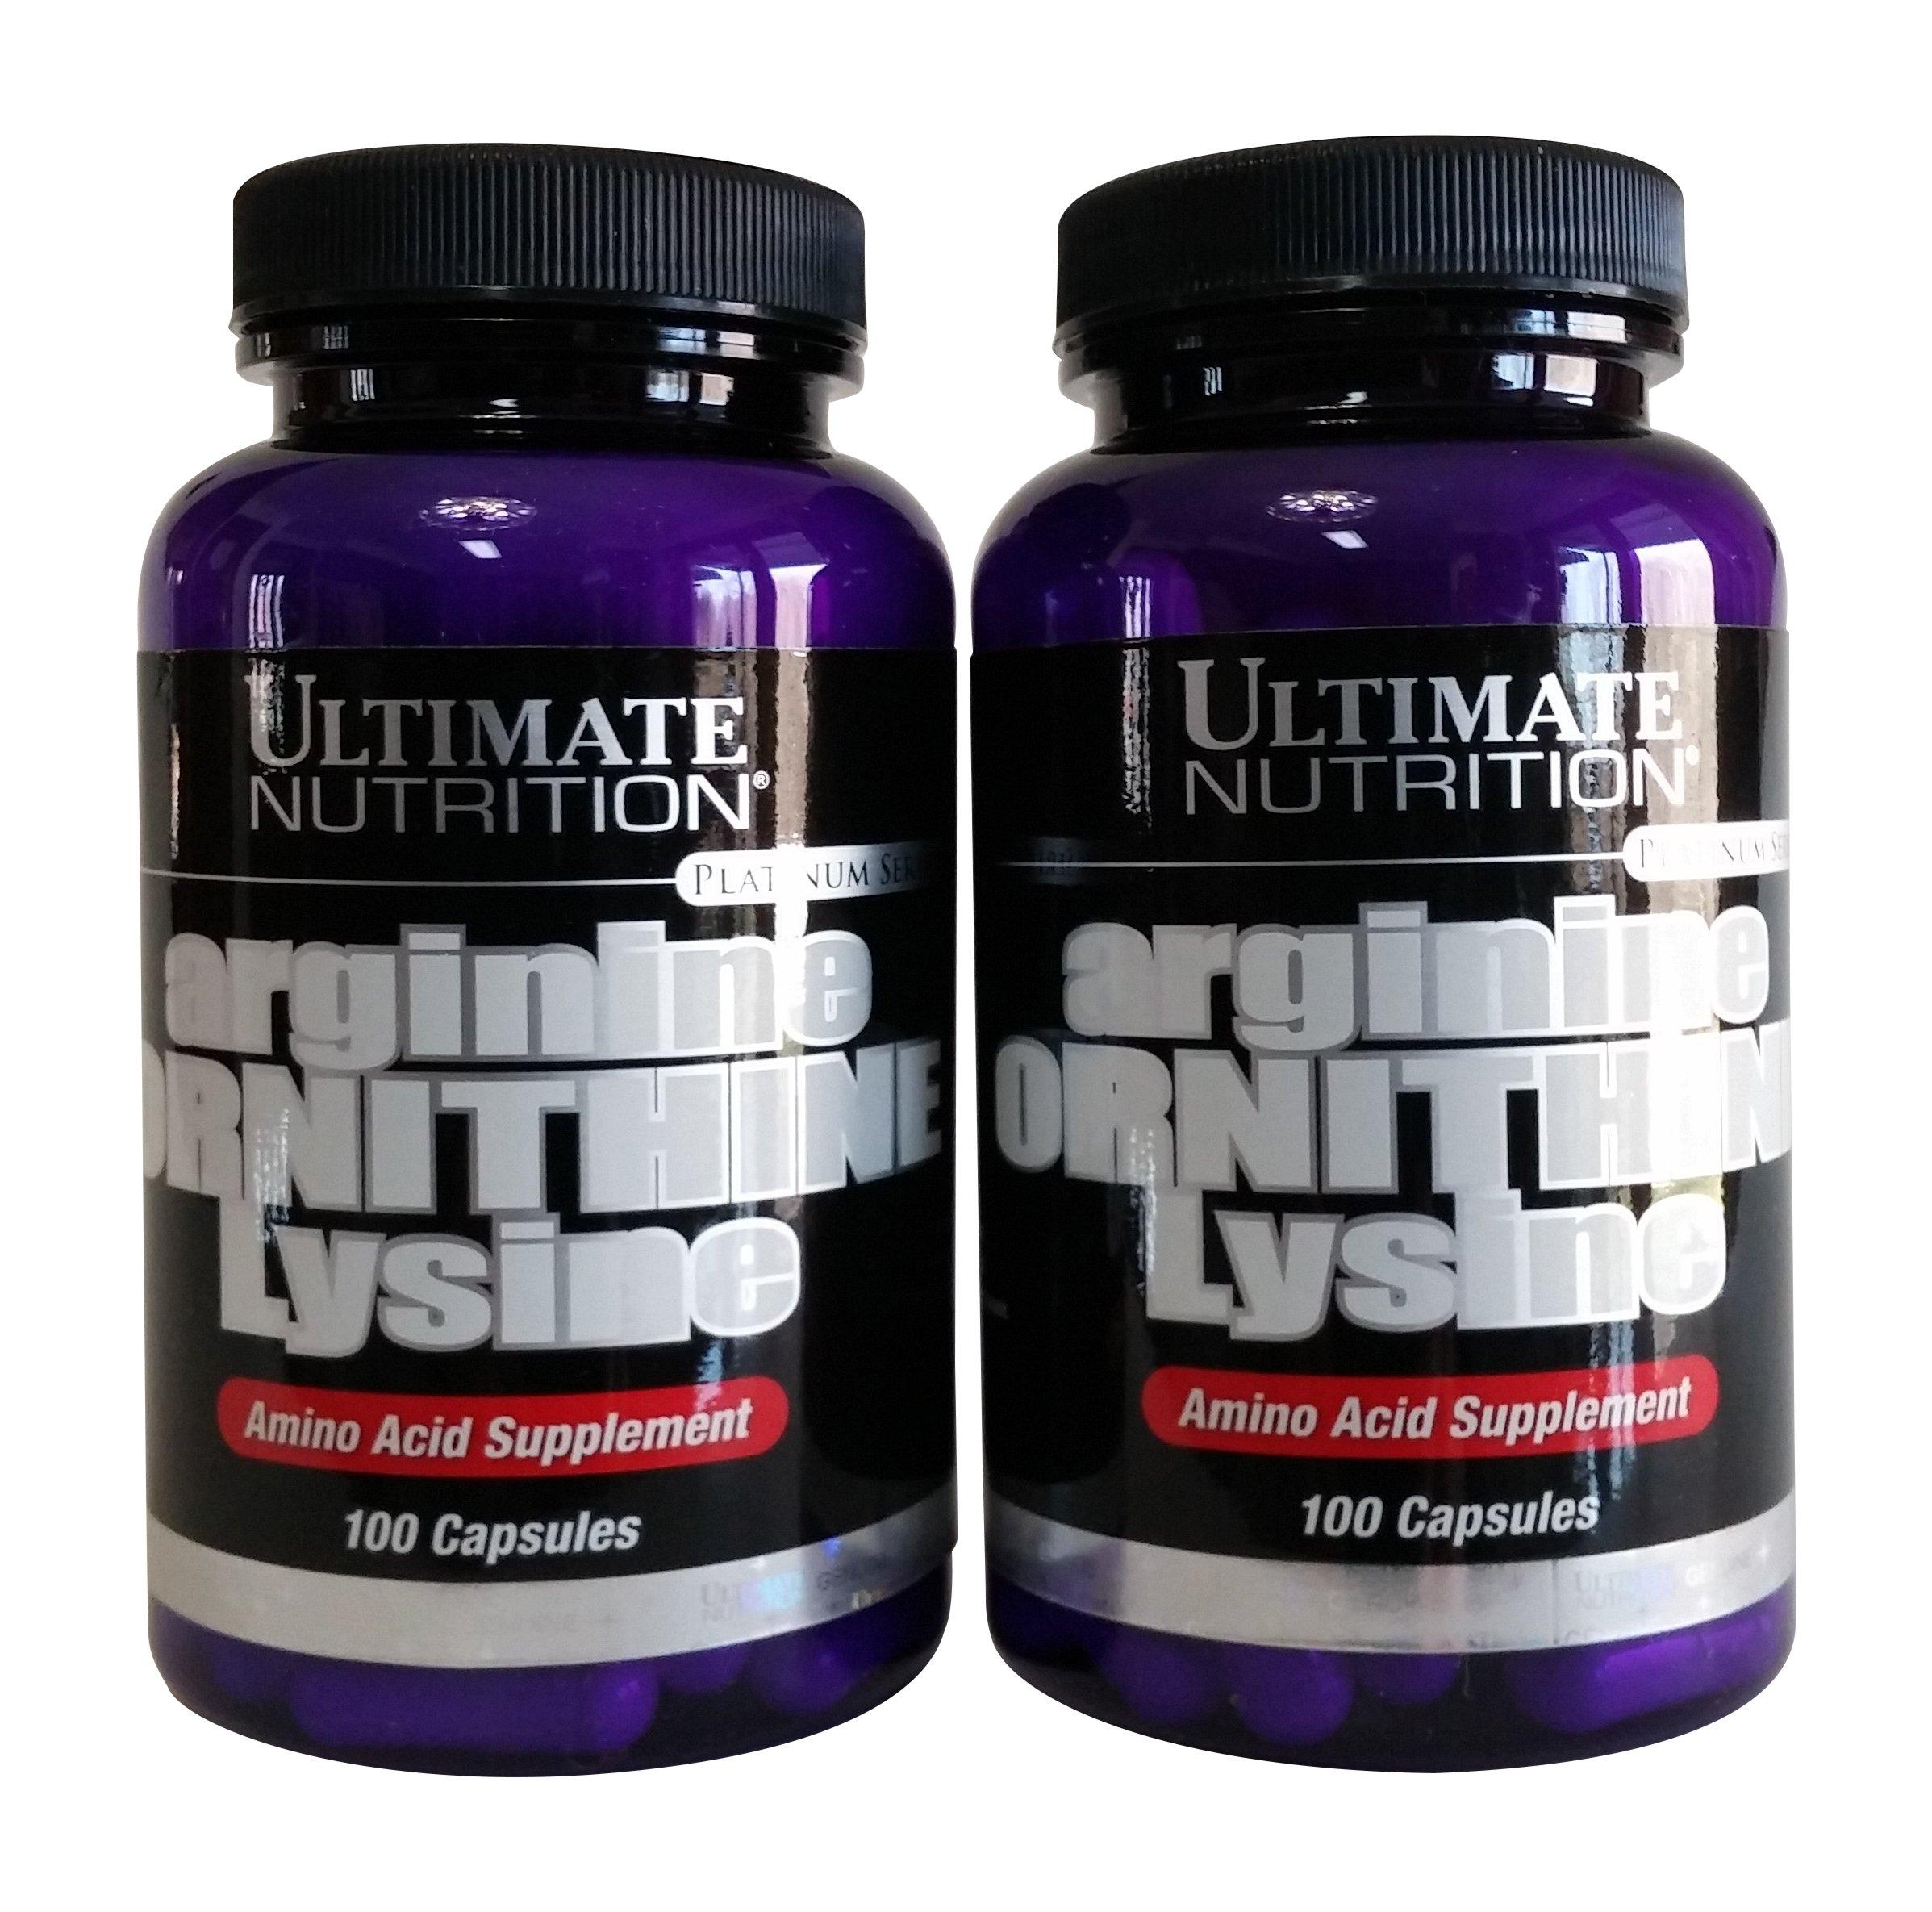 Ultimate Nutrition Arginine Ornithine Lysine Capsules, 100-Count Bottles (Pack of 2)